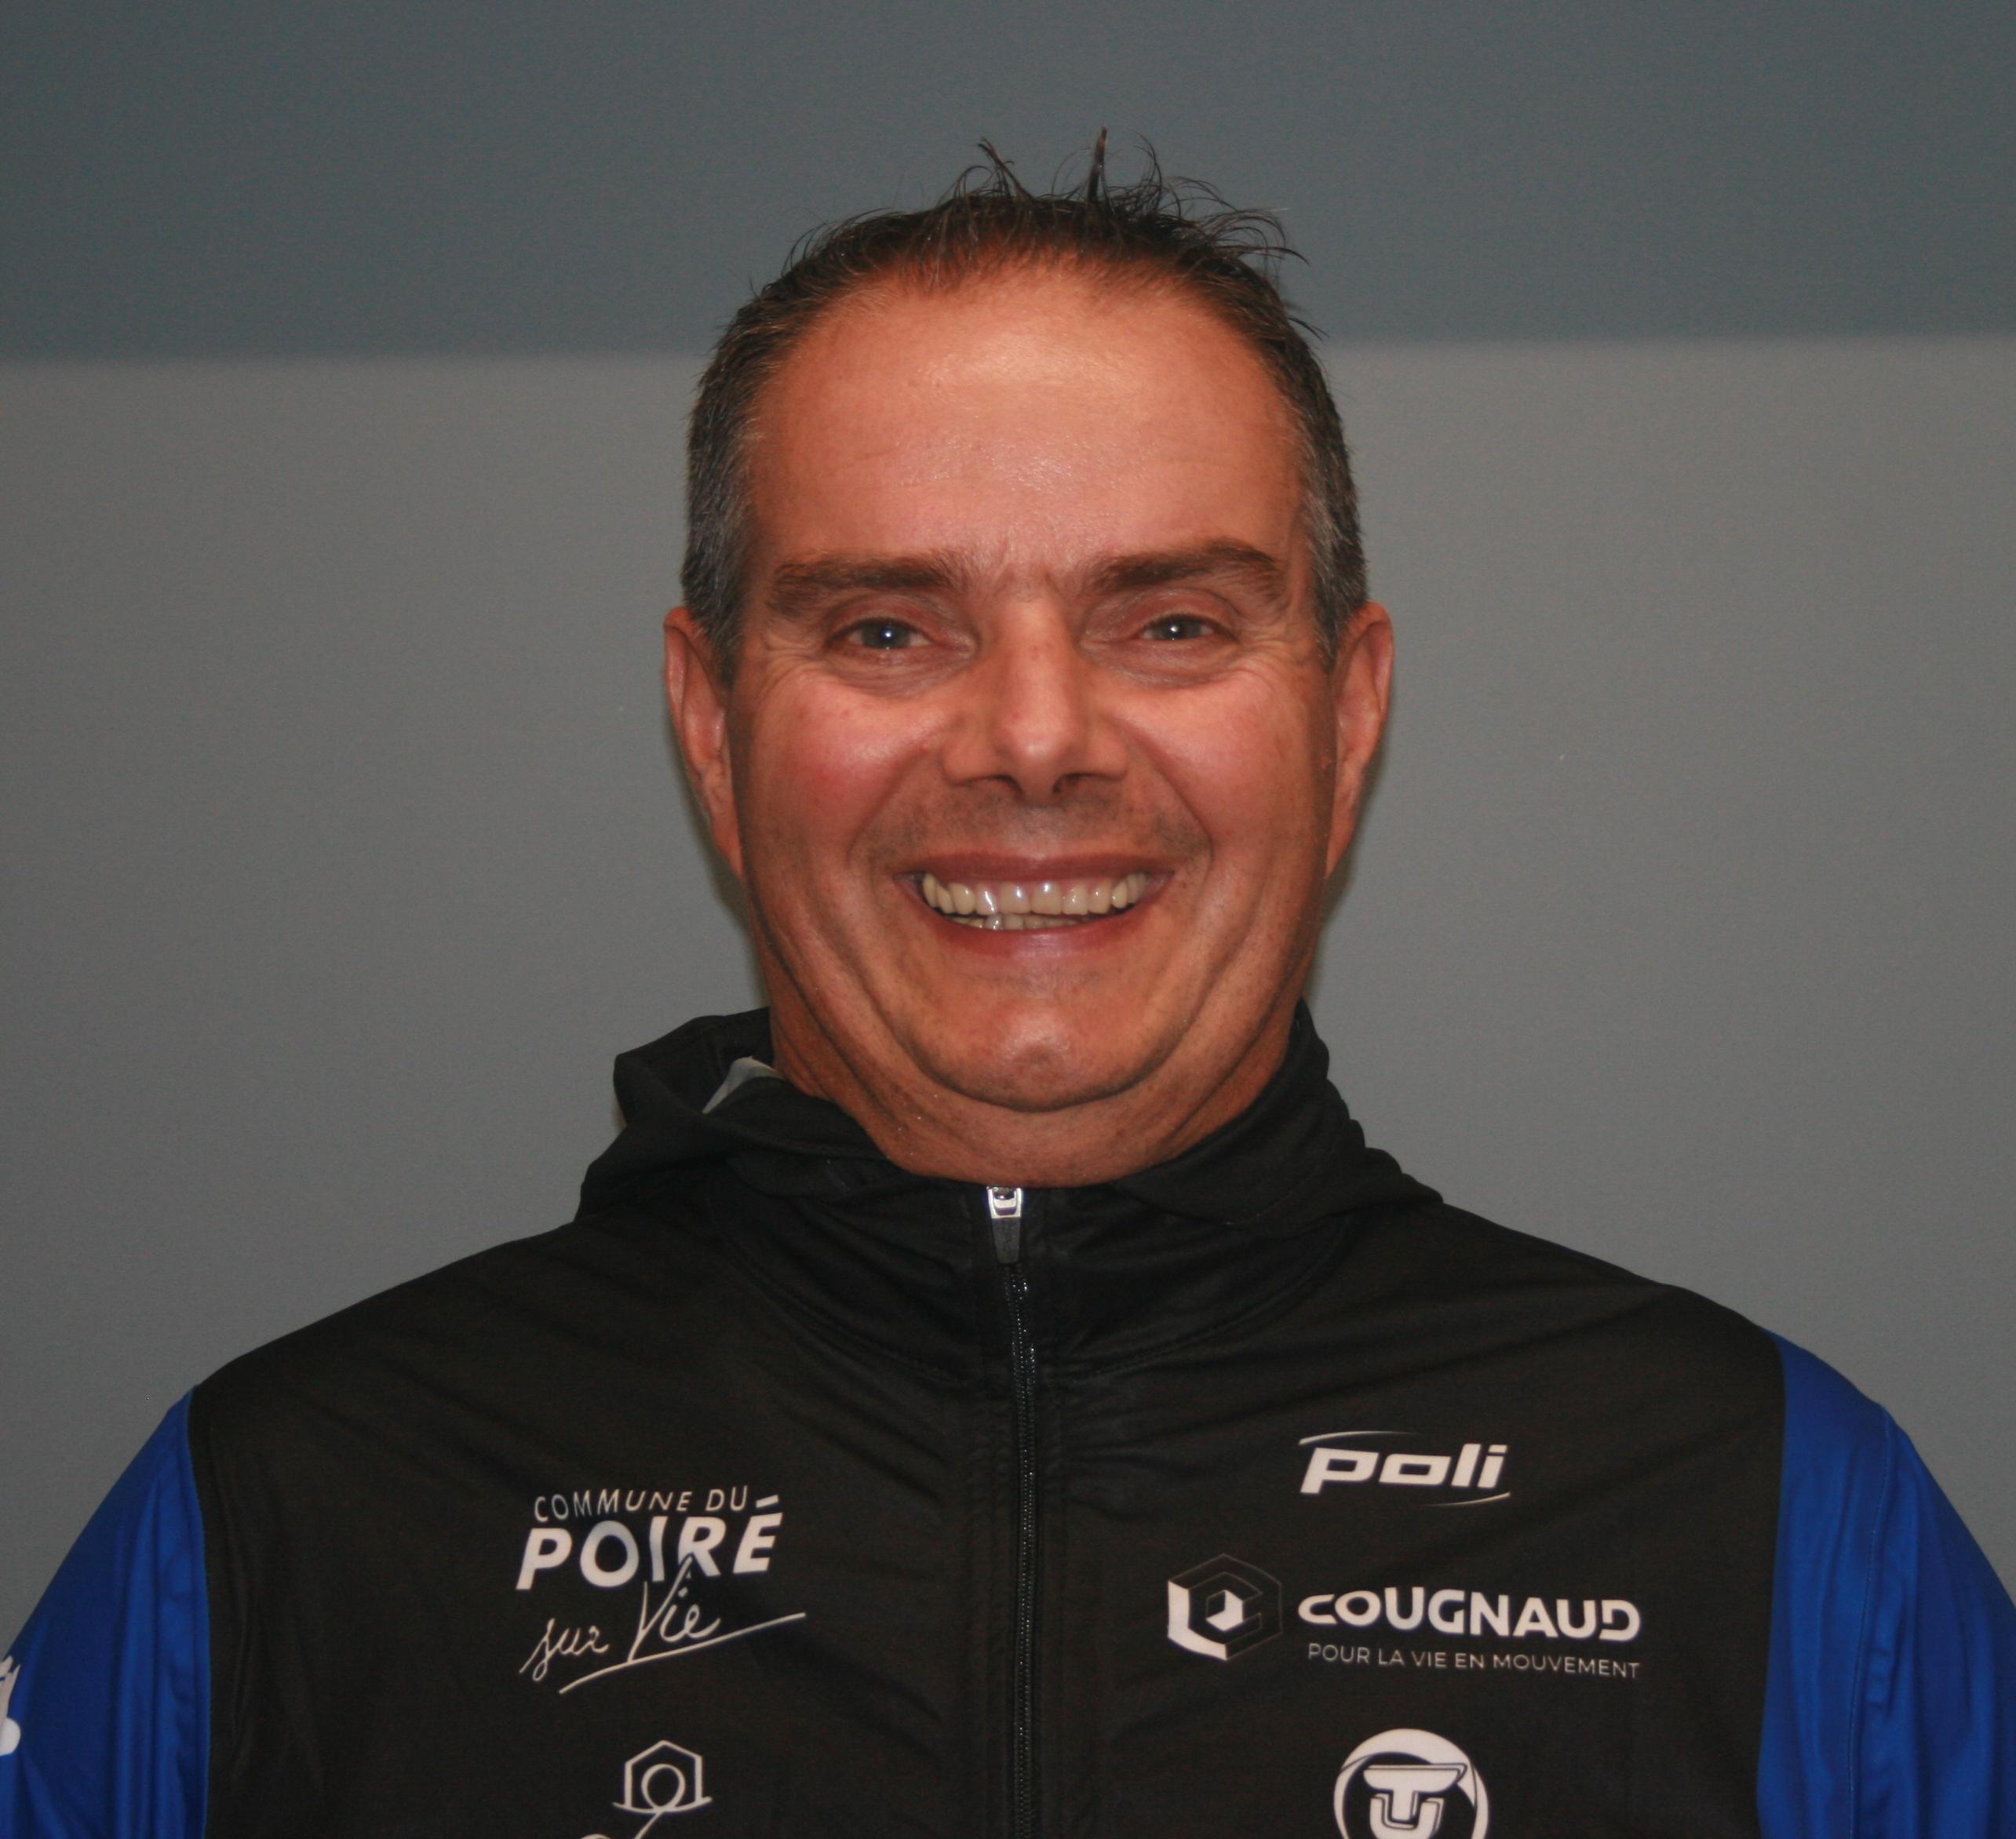 Luc Barreteau